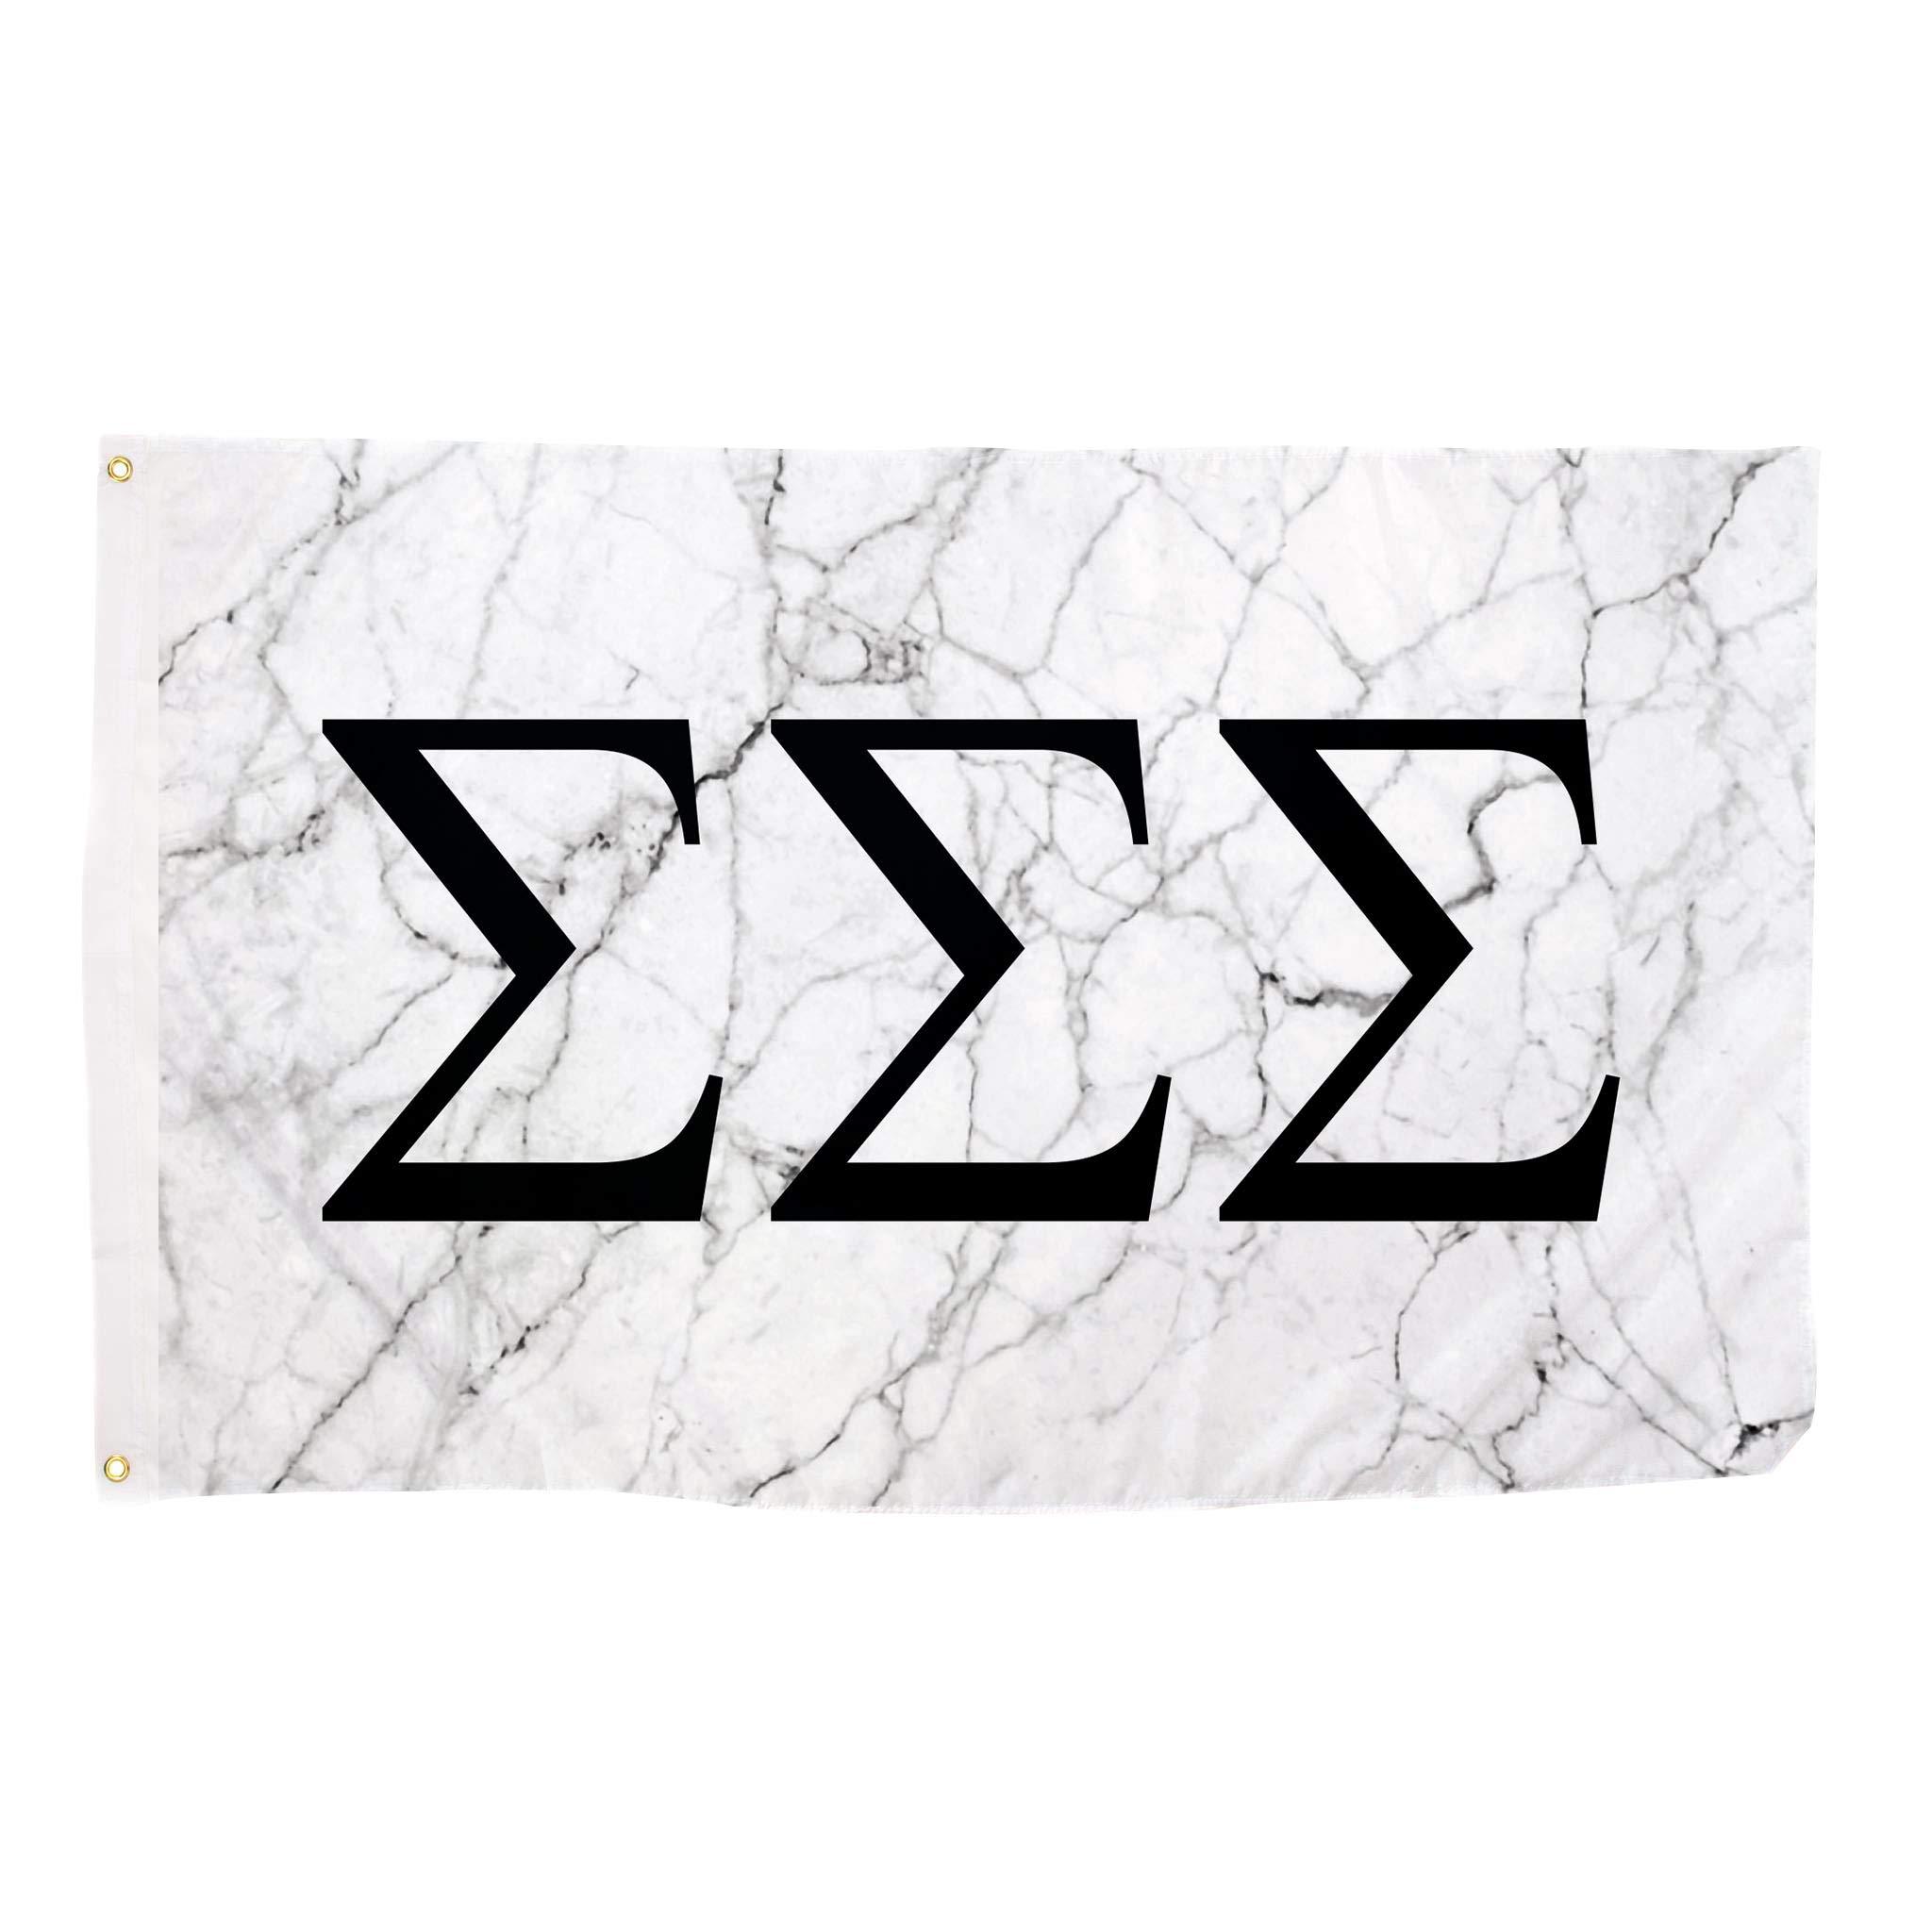 Sigma Sigma Sigma Light Marble Sorority Letter Flag Banner 3 x 5 Sign Decor Tri-Sig